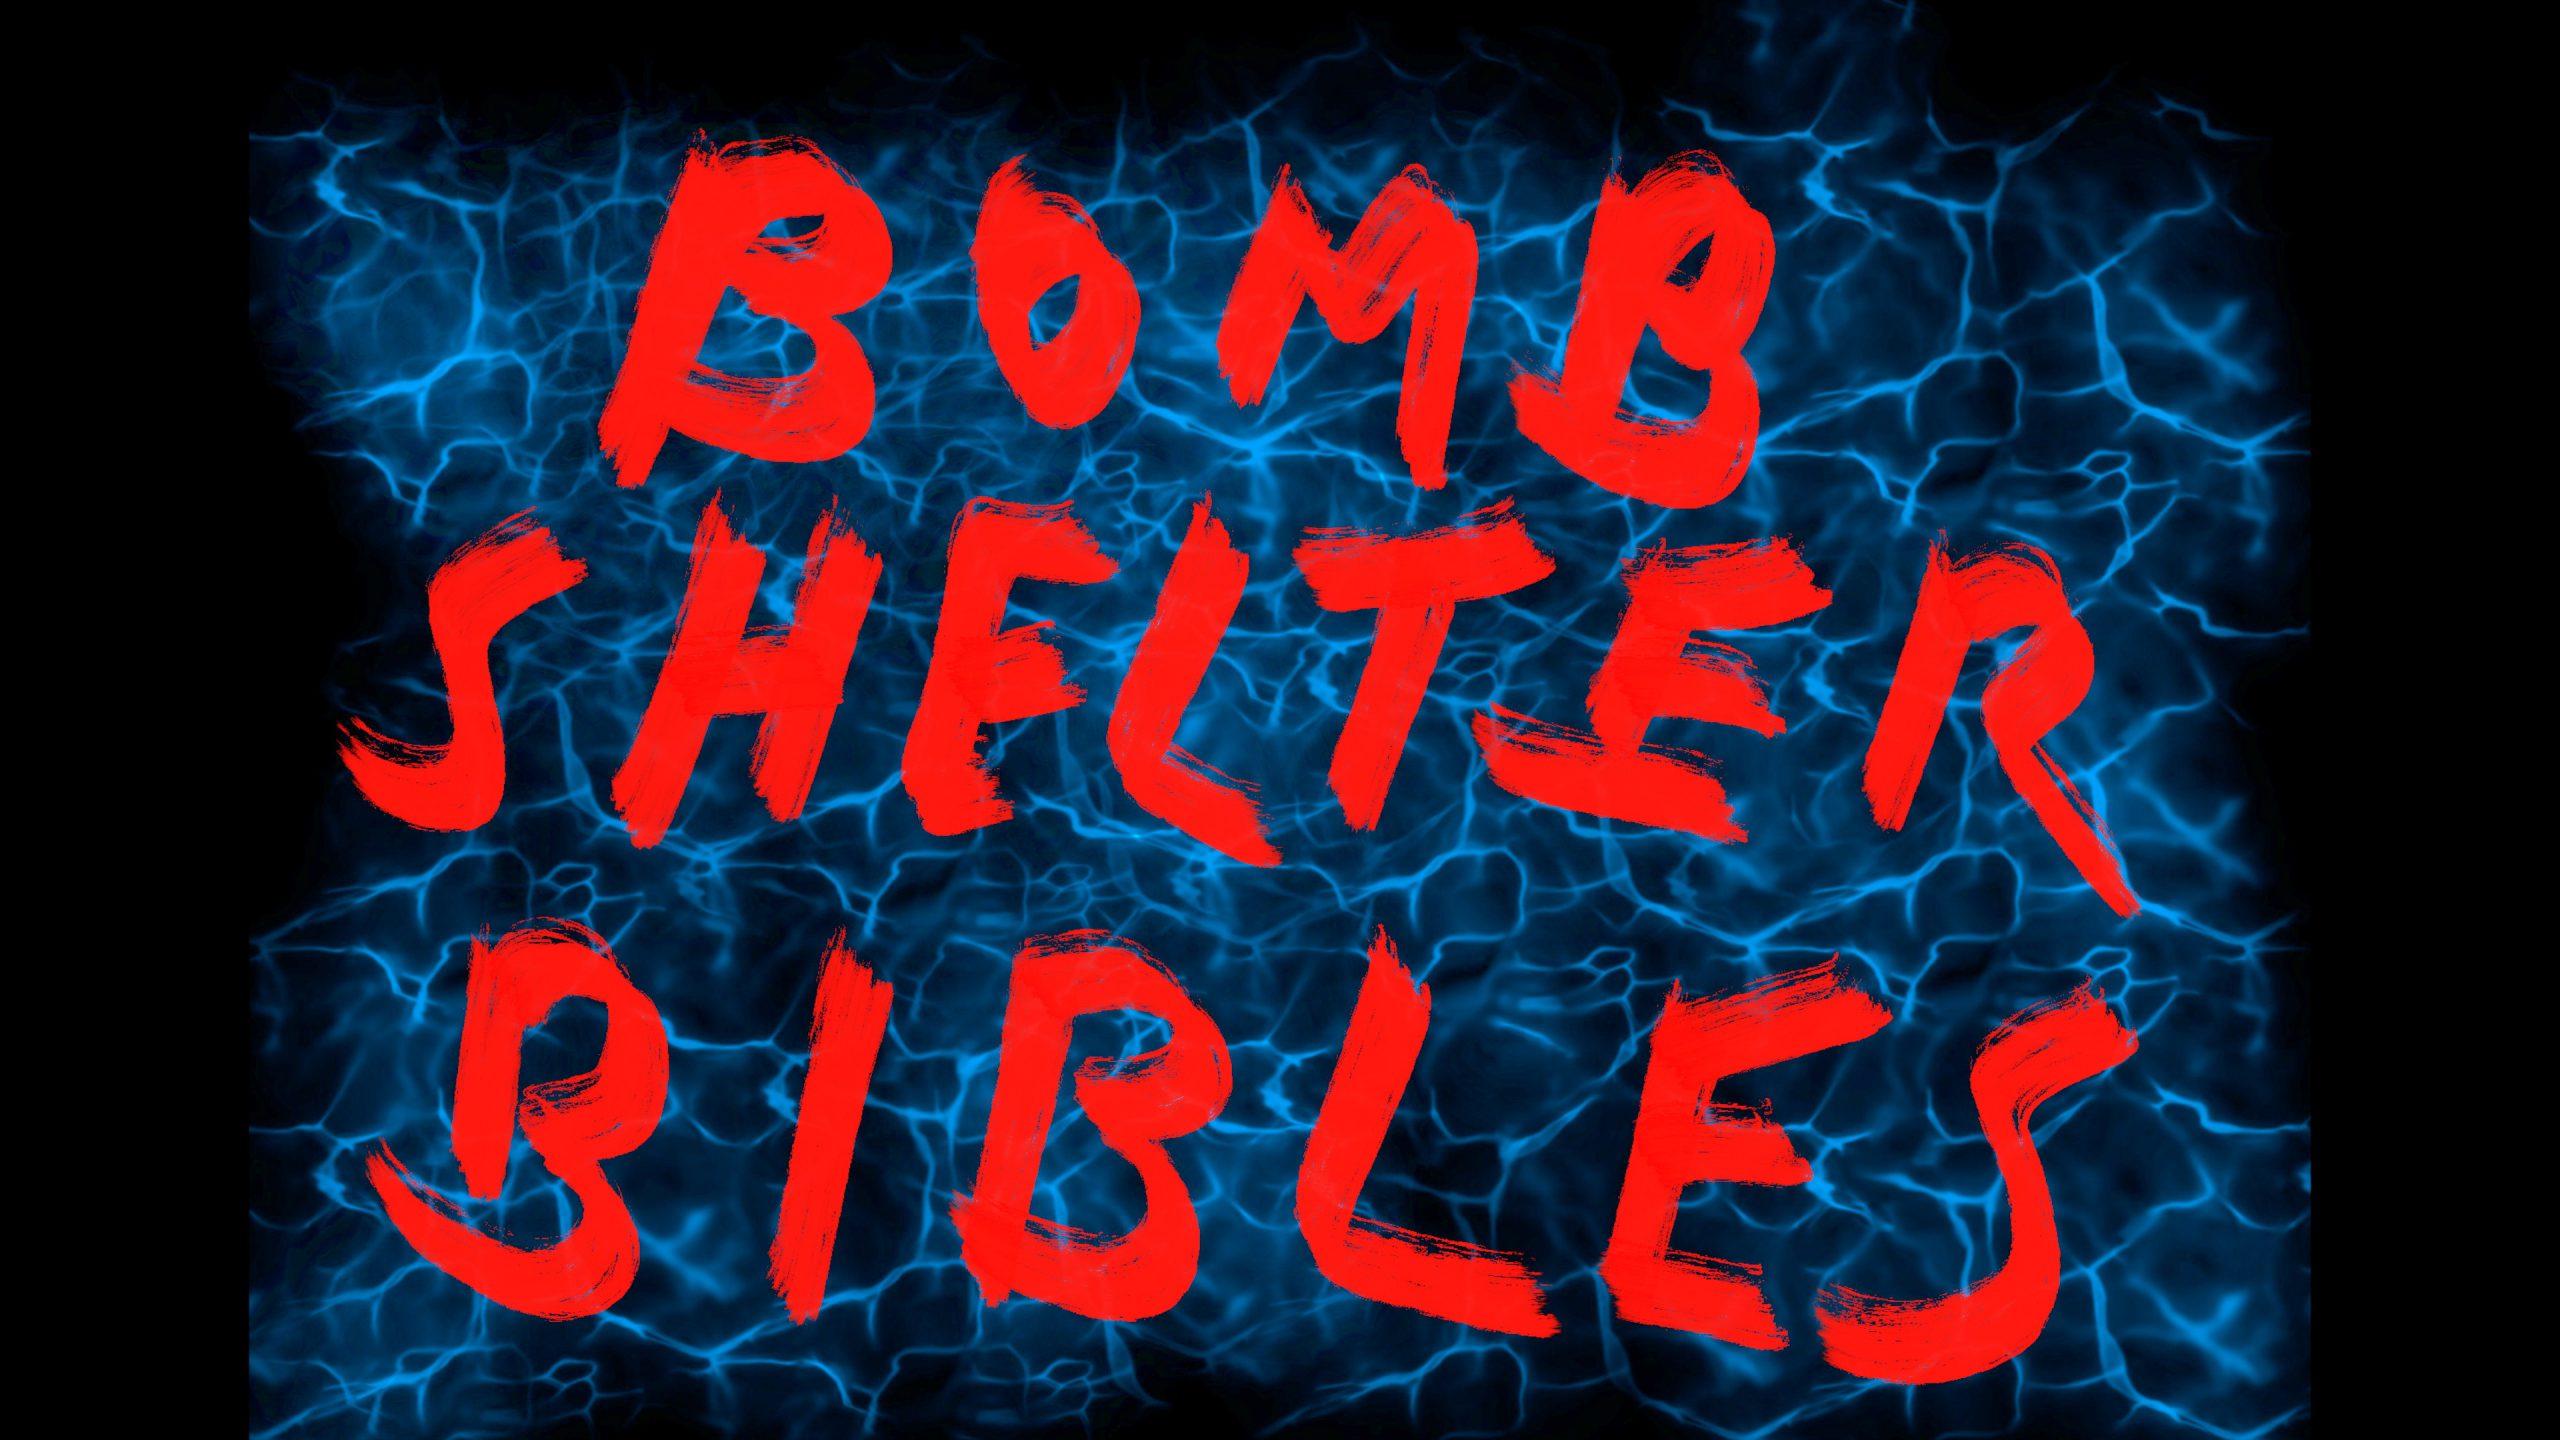 Bomb Shelter Bibles